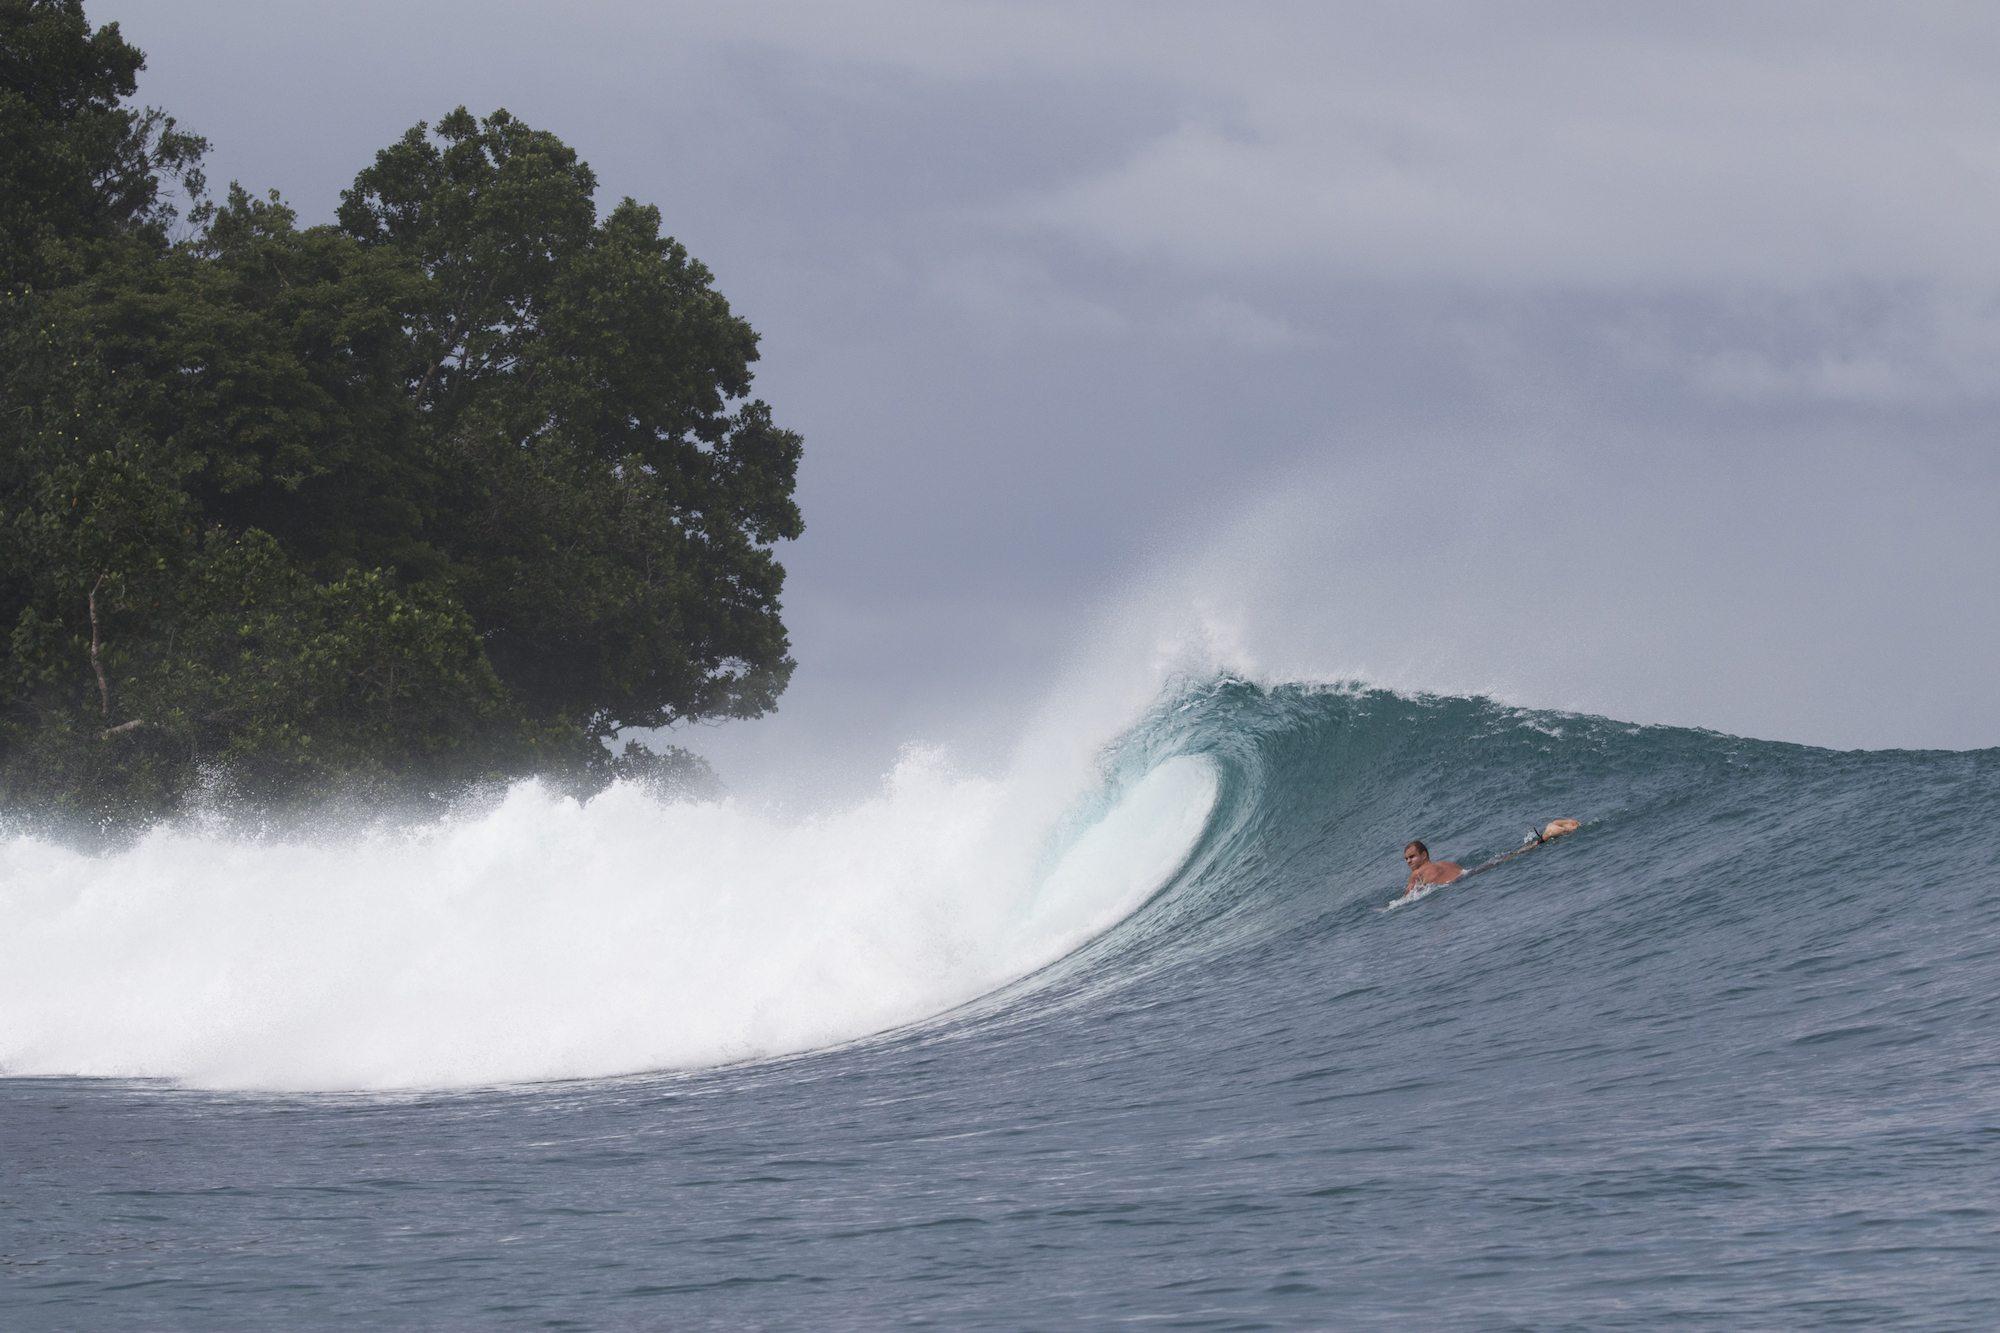 Clarets / Lolok Point / Bay of Plenty Lefts 14